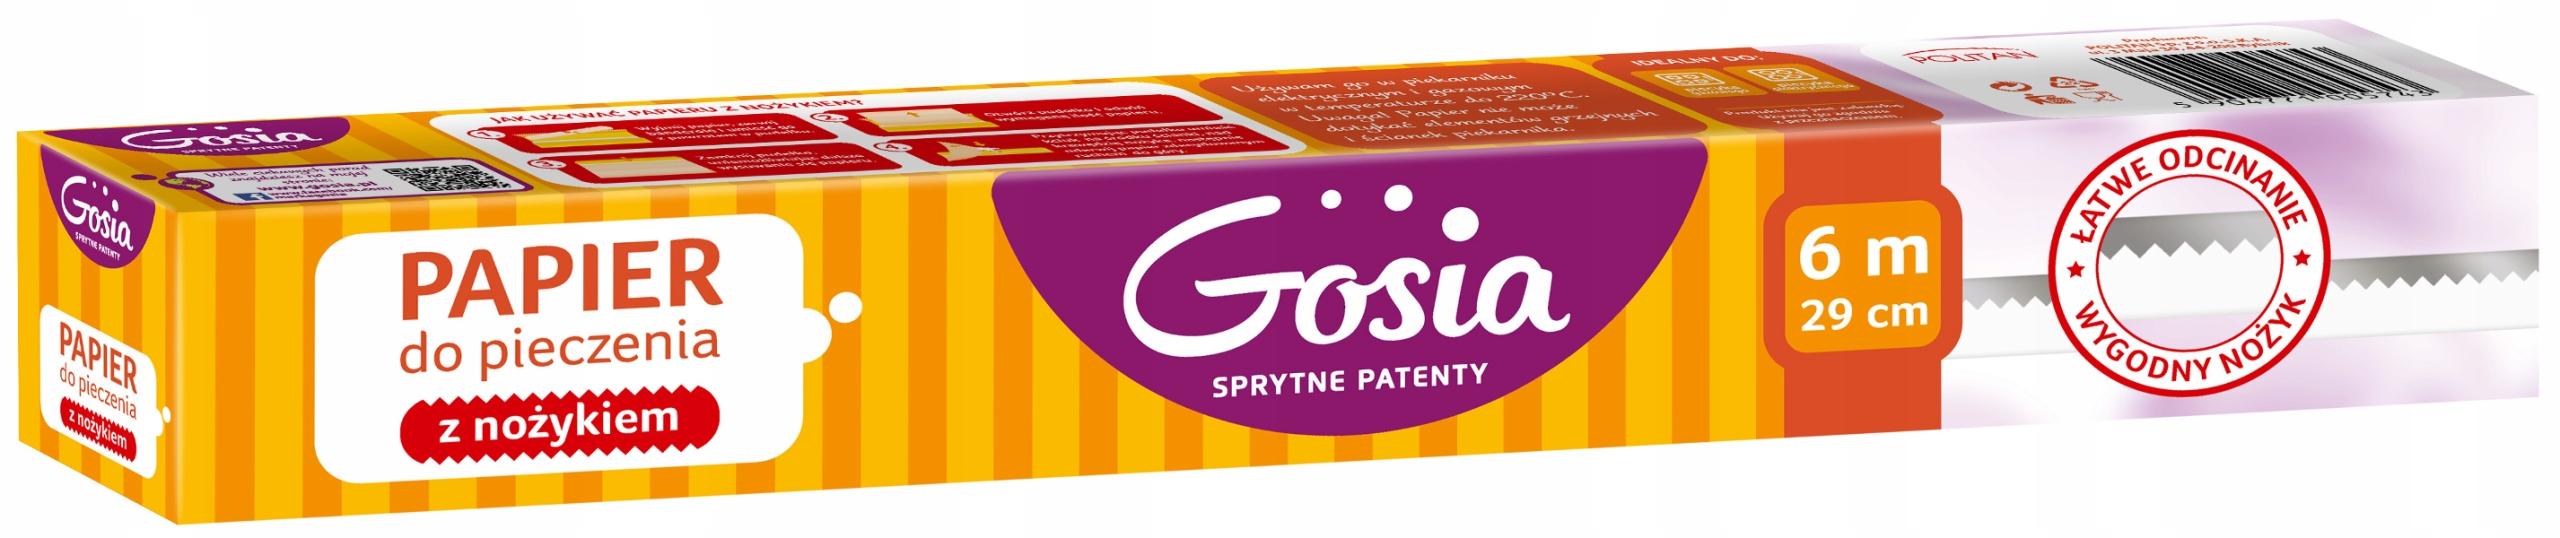 Goshia Бумага для выпечки с ножиком box 290мм 6м